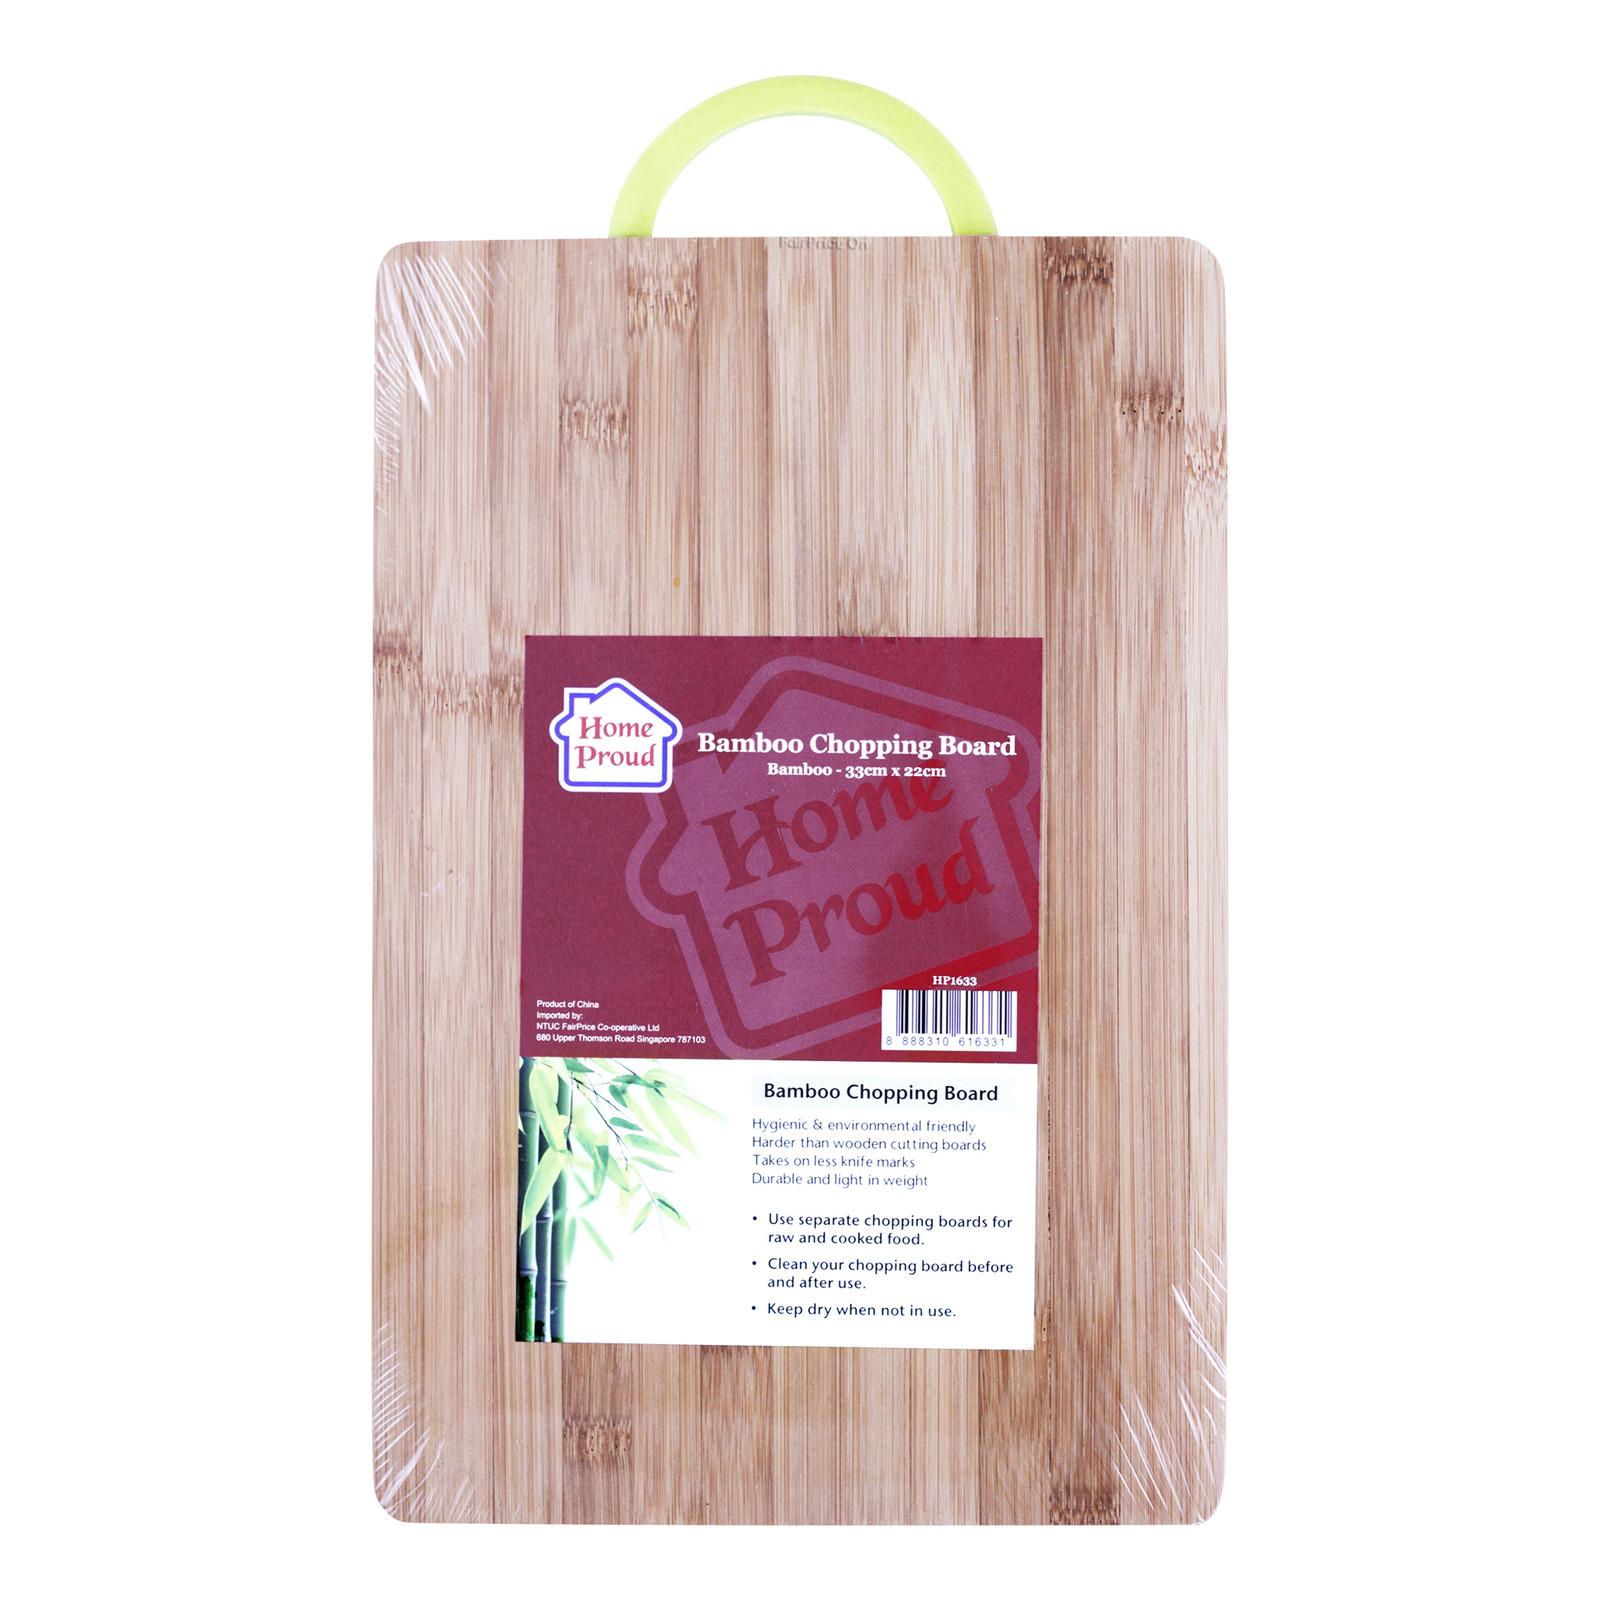 HomeProud Chopping Board - Bamboo (33 x 22cm)